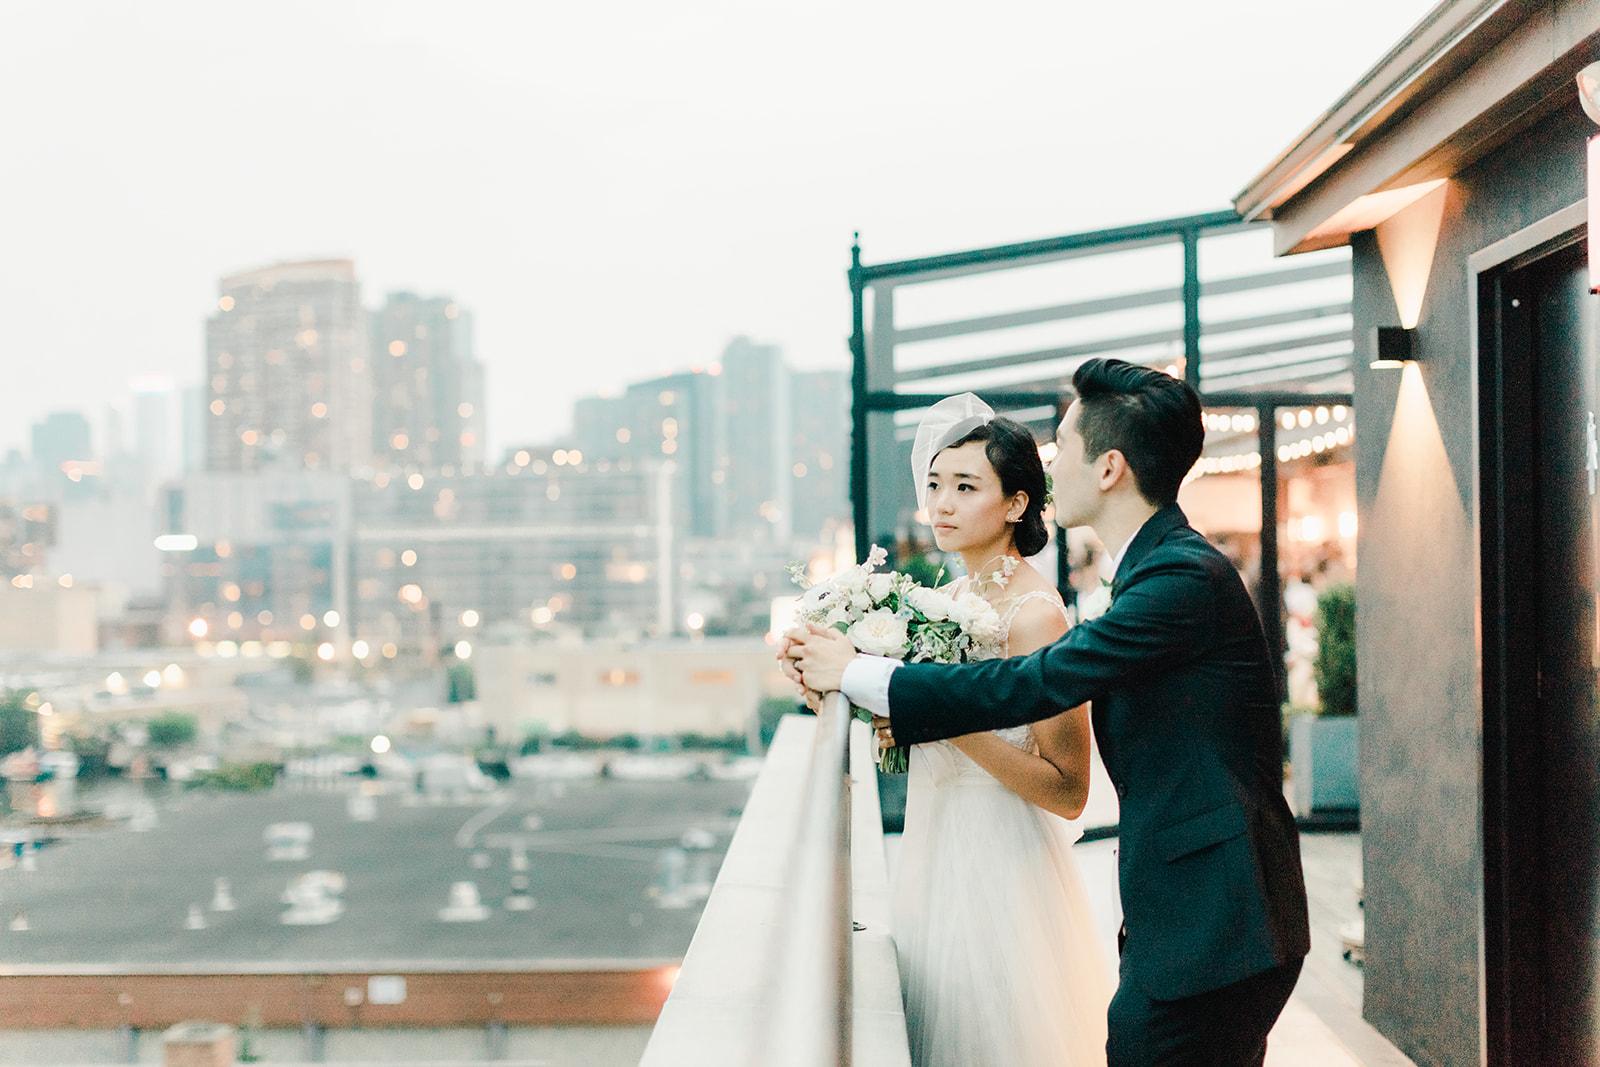 JWHJ-married-406.jpg